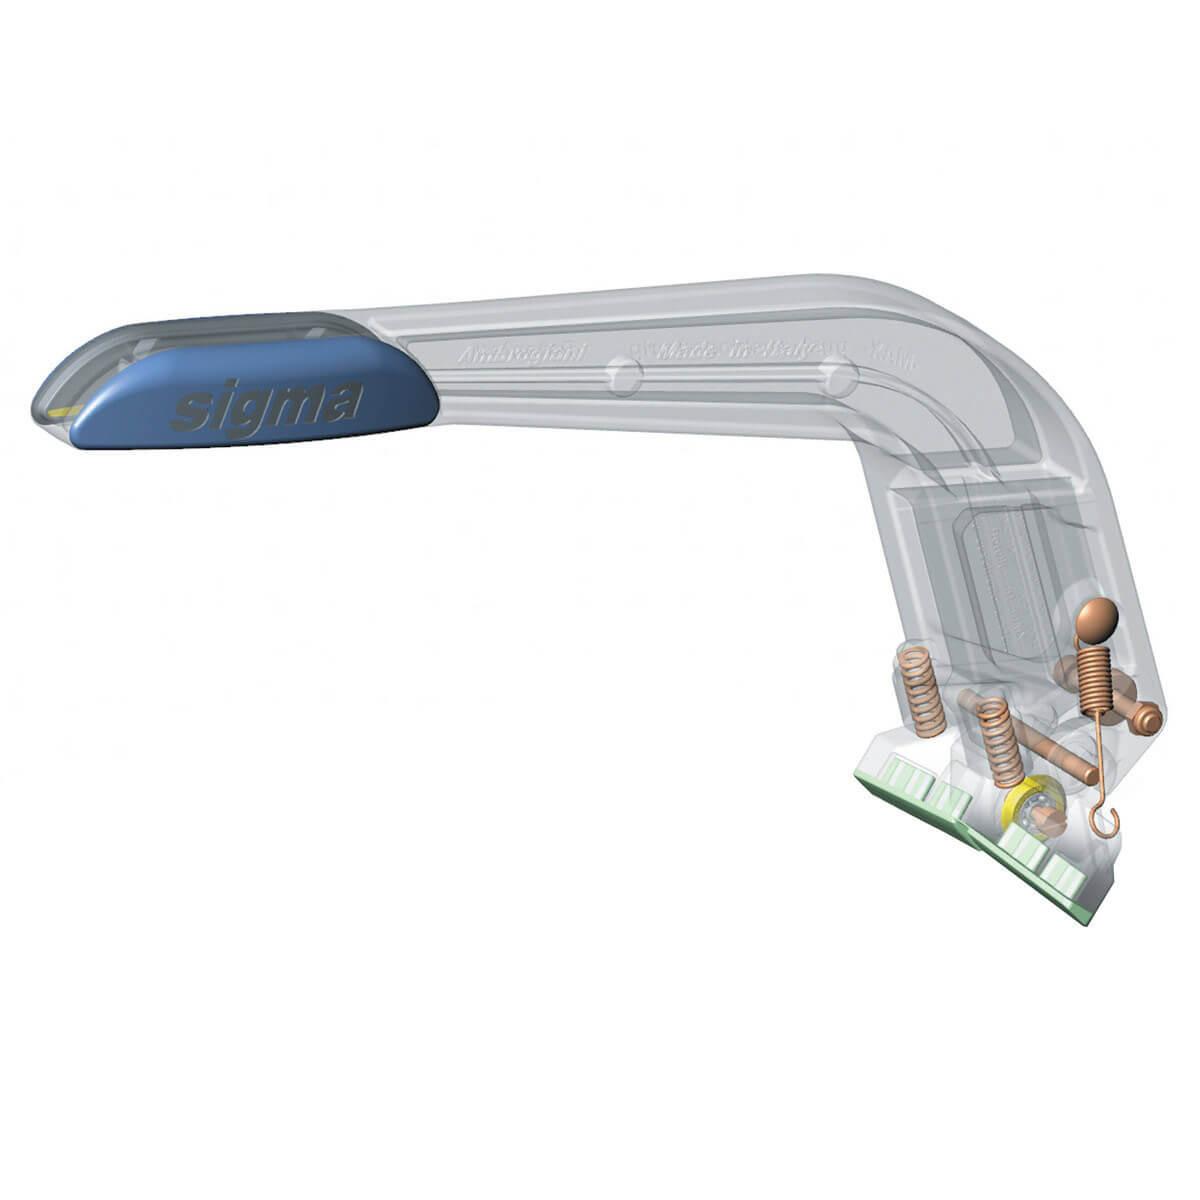 Sigma Max cutter handle cut away